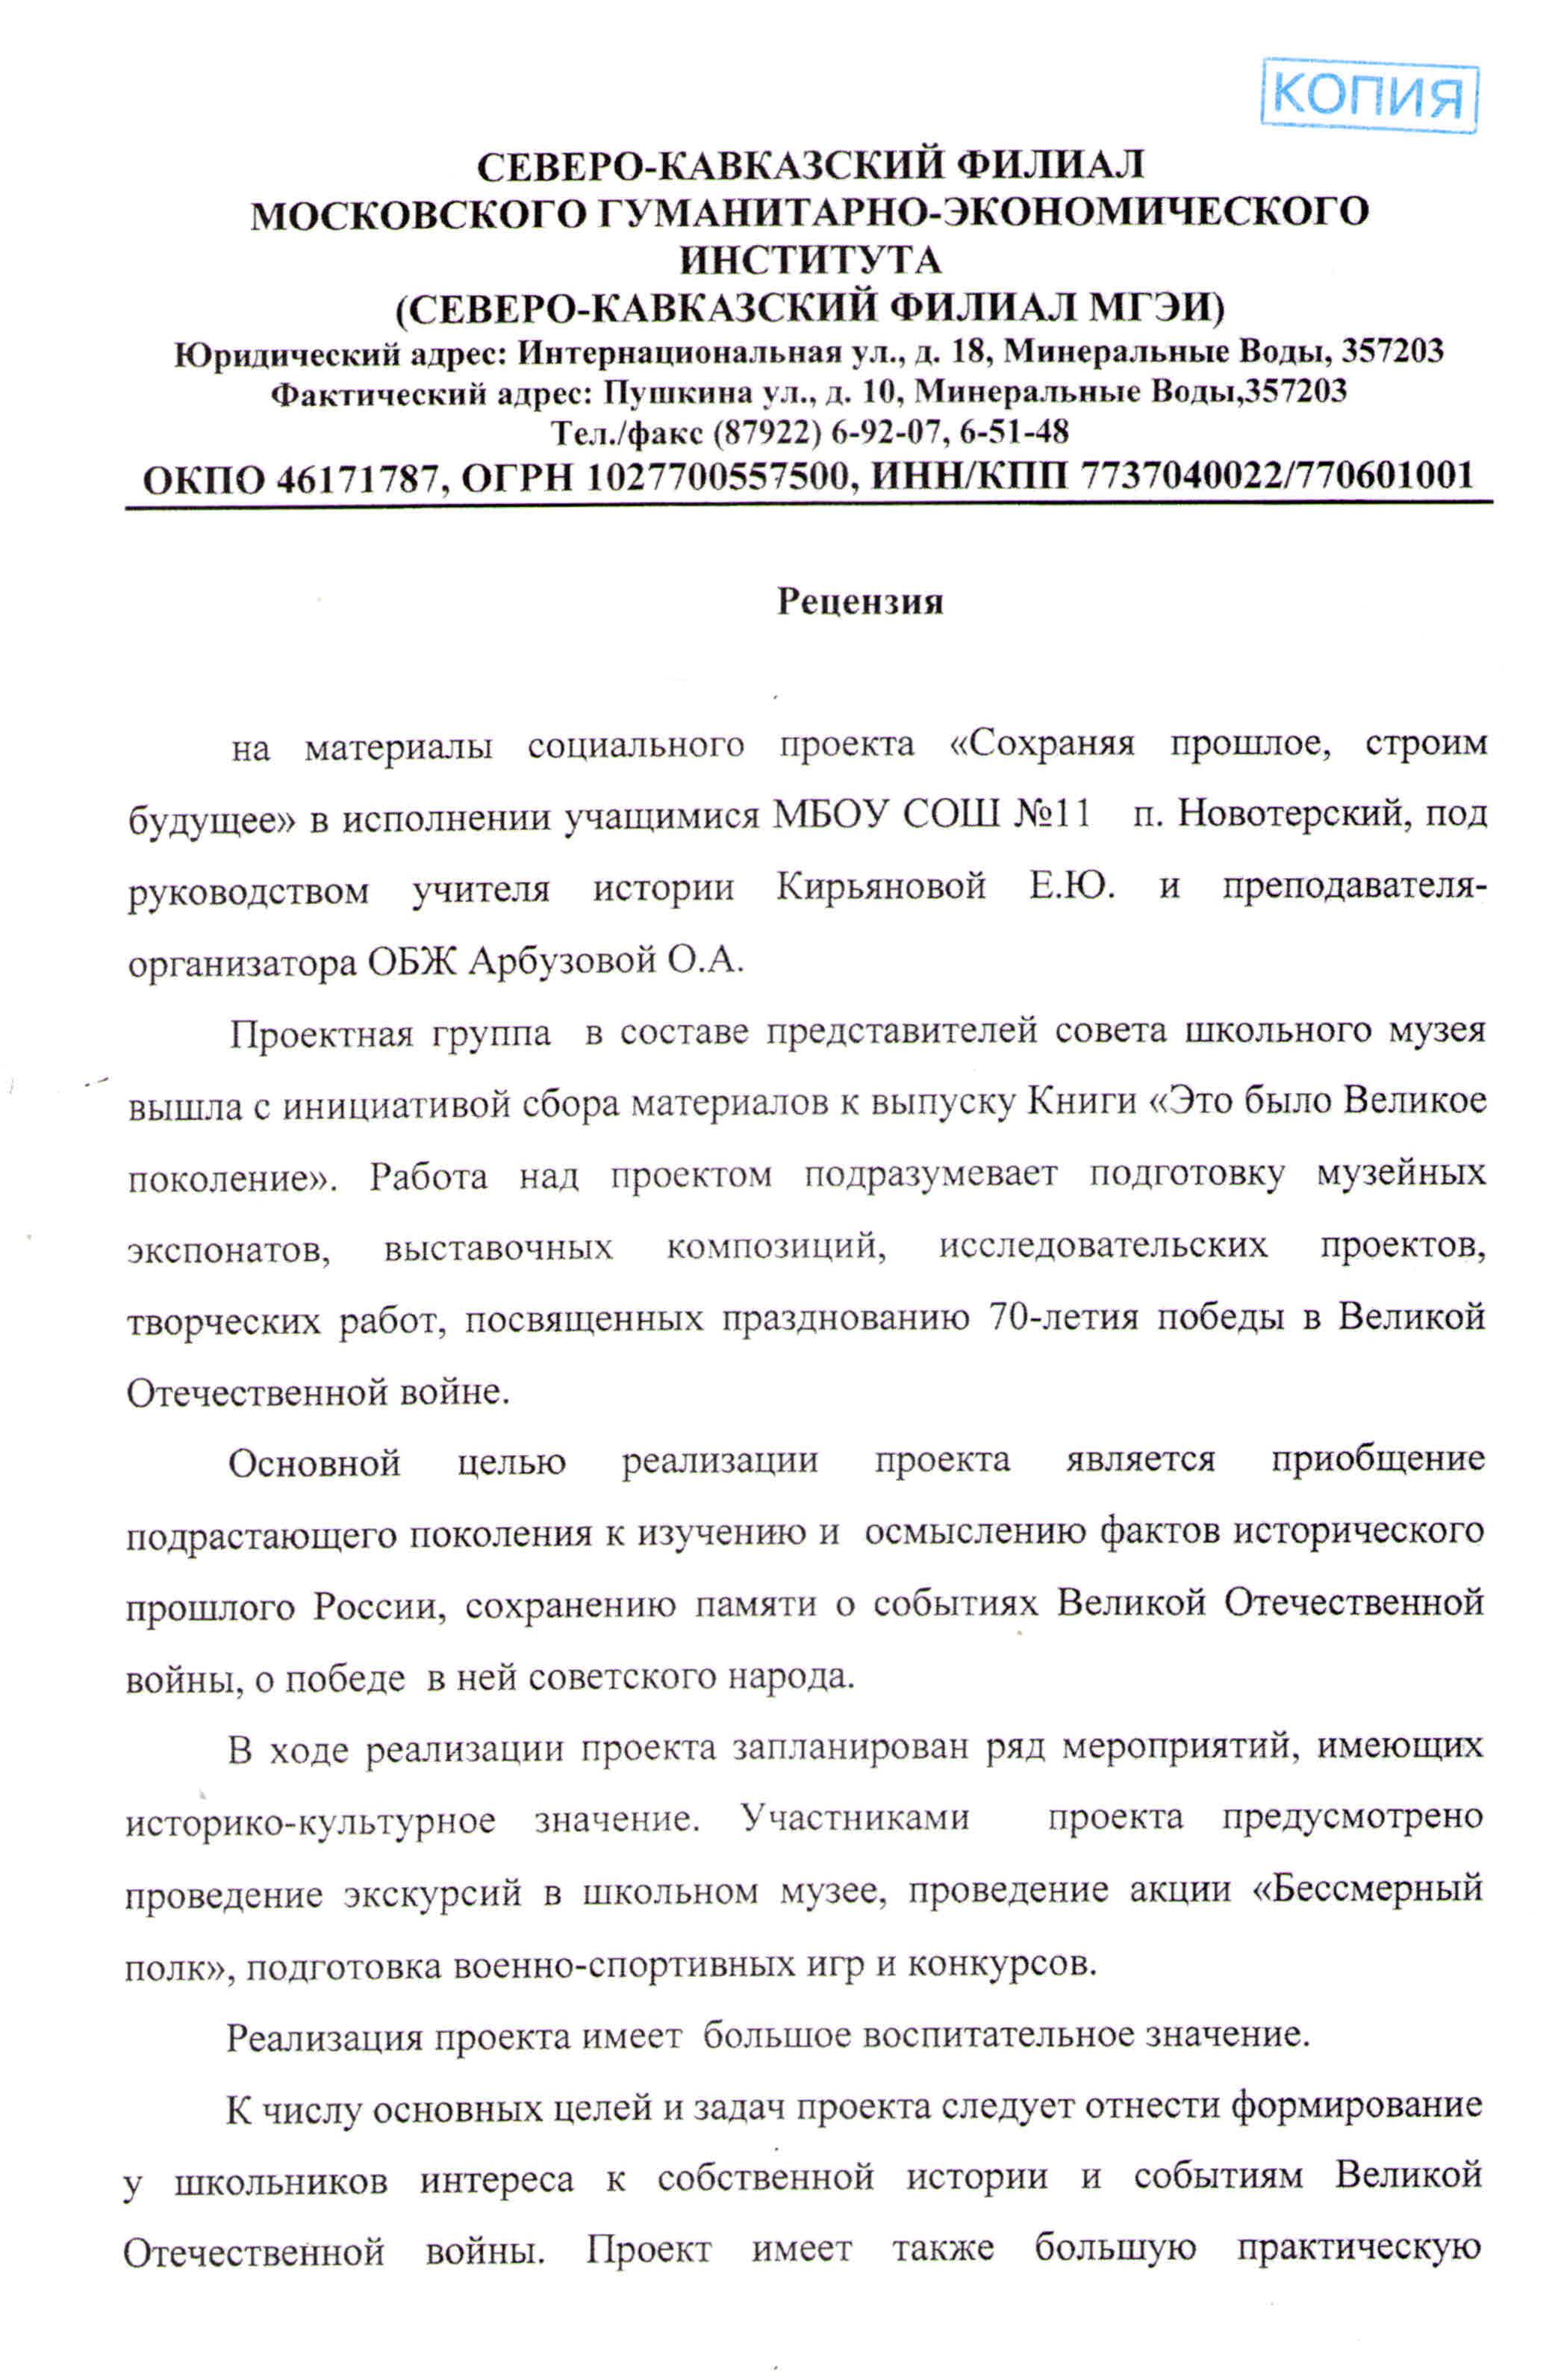 C:\Users\Сергей\Desktop\док-ты\Document_2.jpg